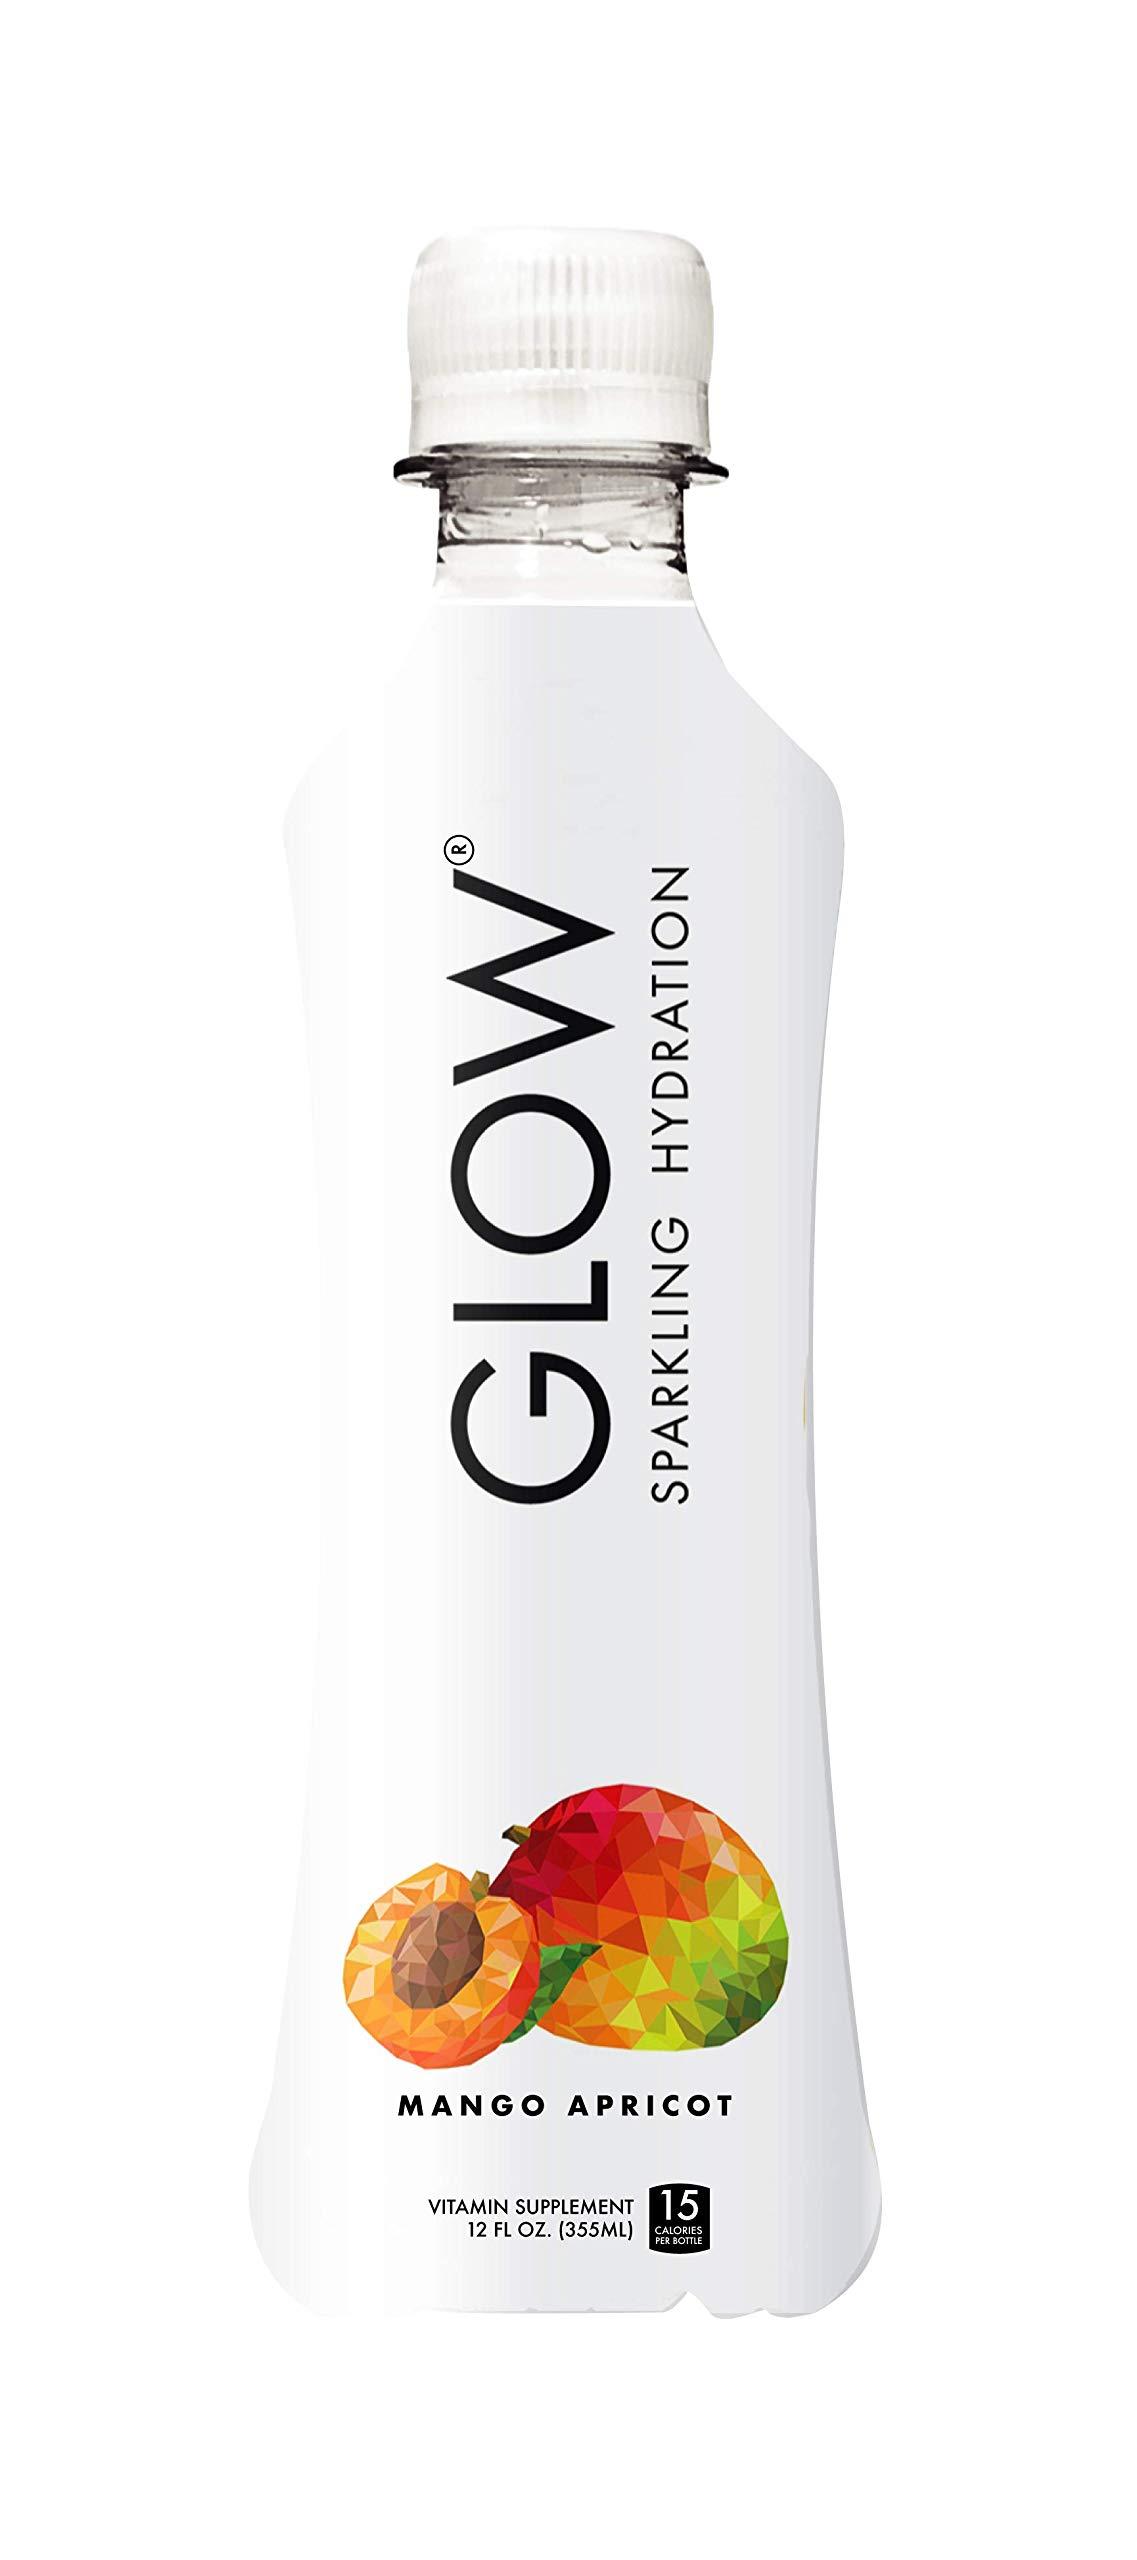 GLOW Beverages Premium Sparkling Infused Electrolyte Hydration Drink - 6 Pack 10.8oz Plastic - Mango Apricot - Vitamins & Antioxidants